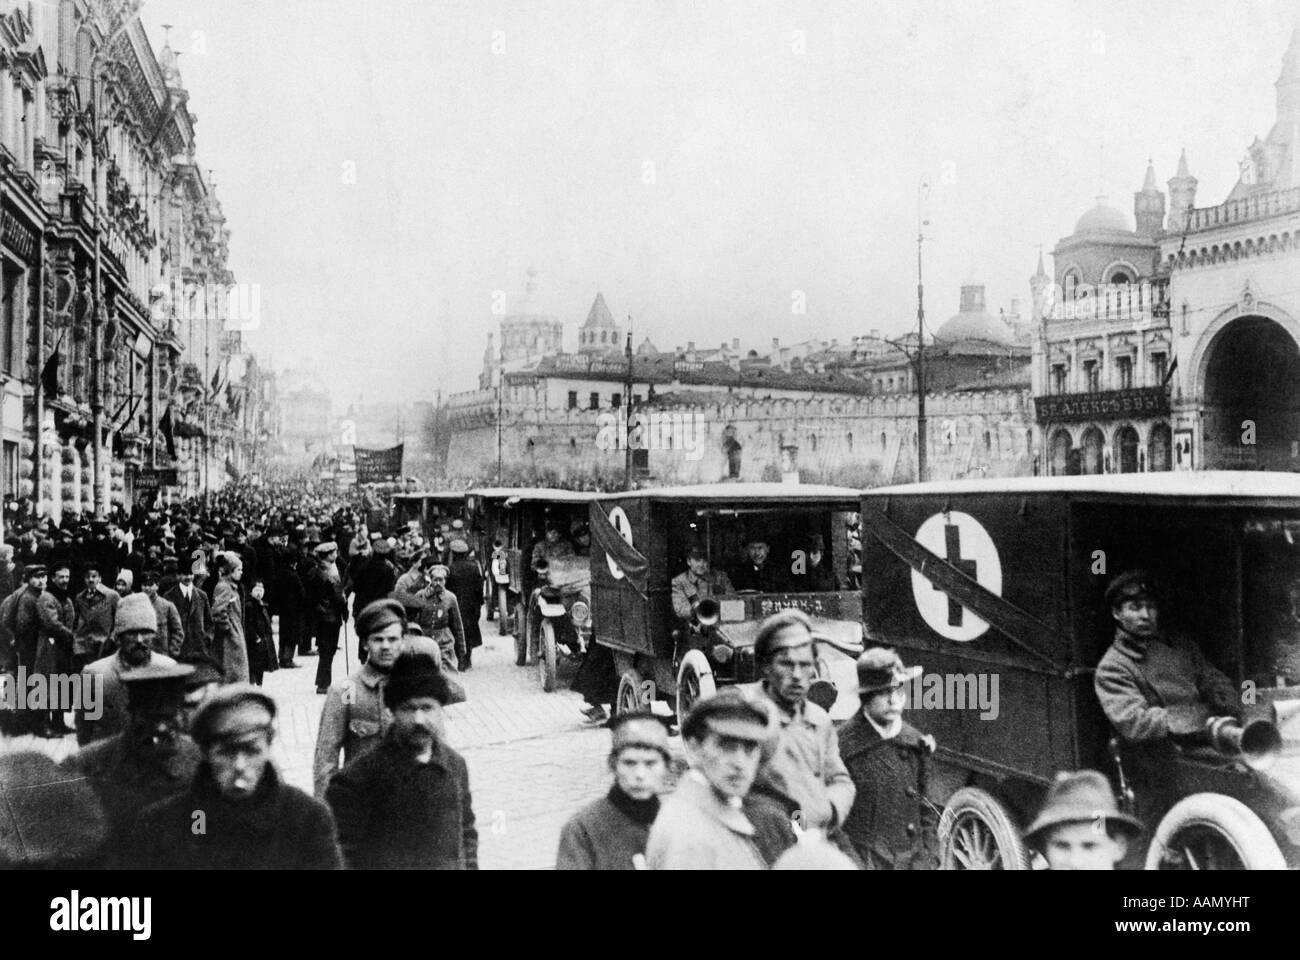 1910s 1917 PETROGRAD REVOLUTIONIST ST. PETER & PAUL RUSSIAN REVOLUTION RED CROSS AMBULANCES FROM WORLD WAR I - Stock Image